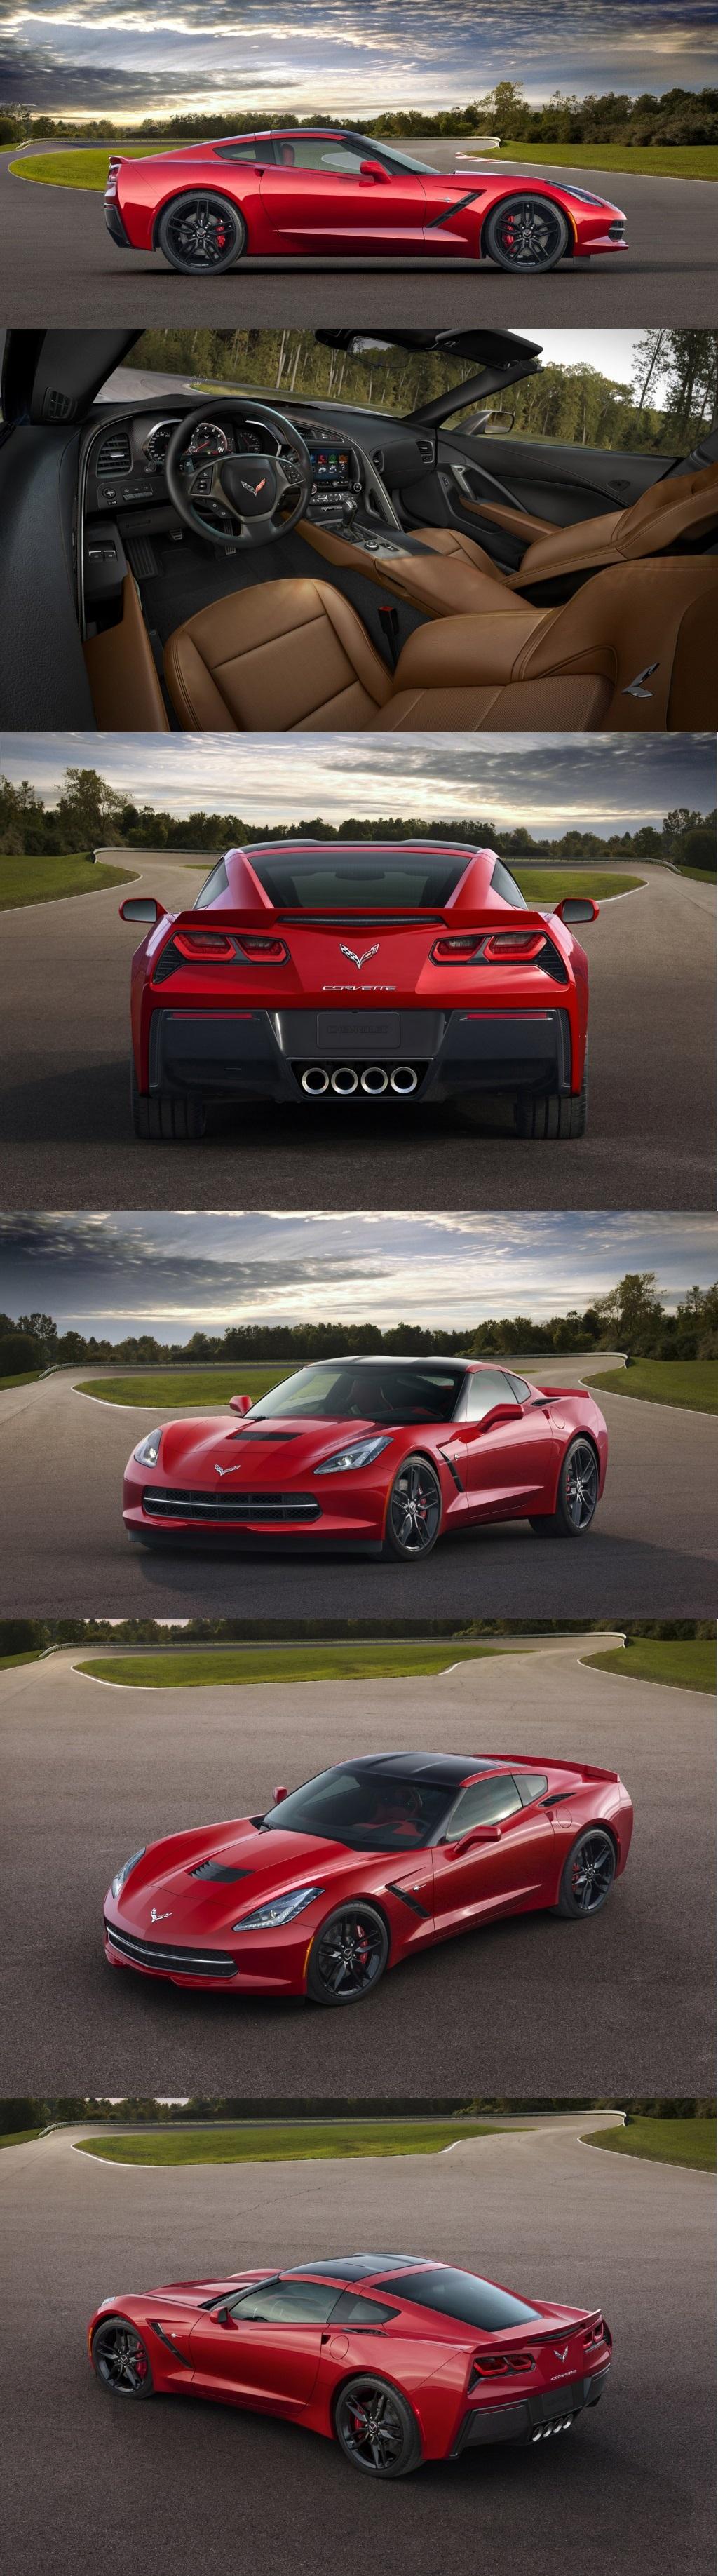 Luv those new Vettes--2014 Chevrolet Corvette Stingray